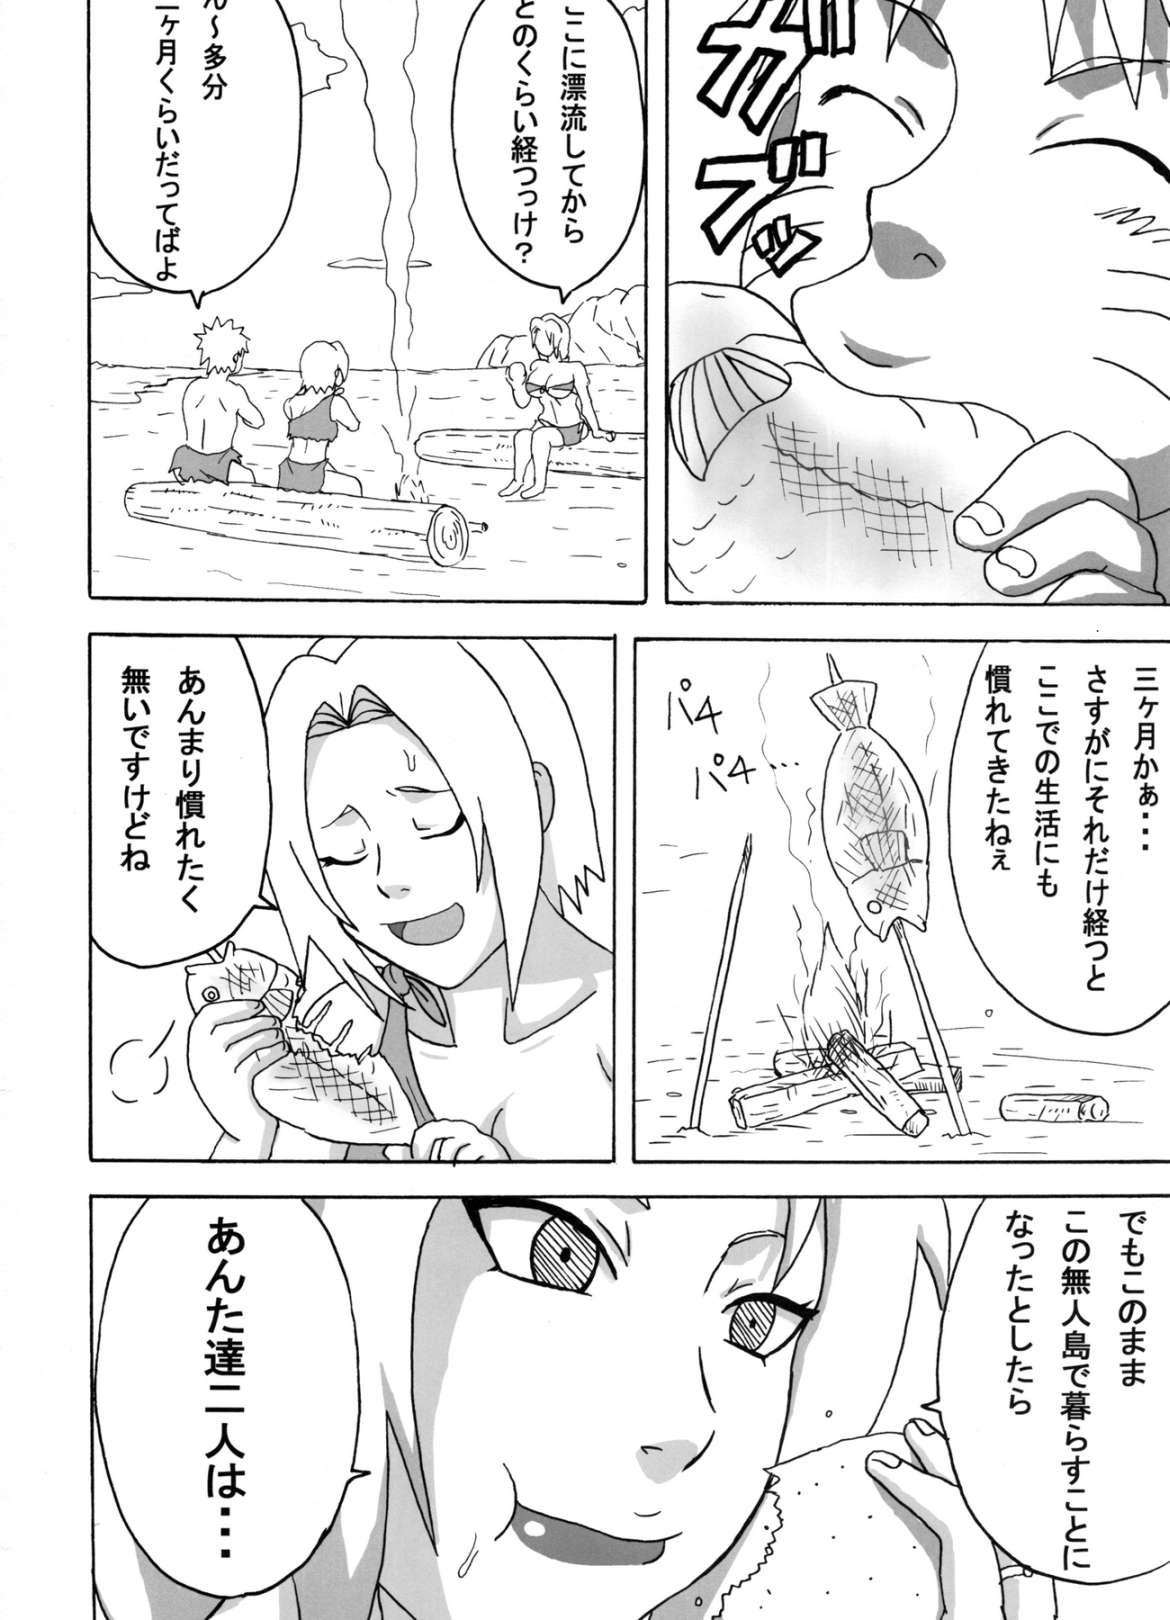 【NARUTO -ナルト- エロ漫画・エロ同人誌】ツナデ、サクラと無人島に漂着したナルトww島でどんどん子孫を増やしていくwwww (3)